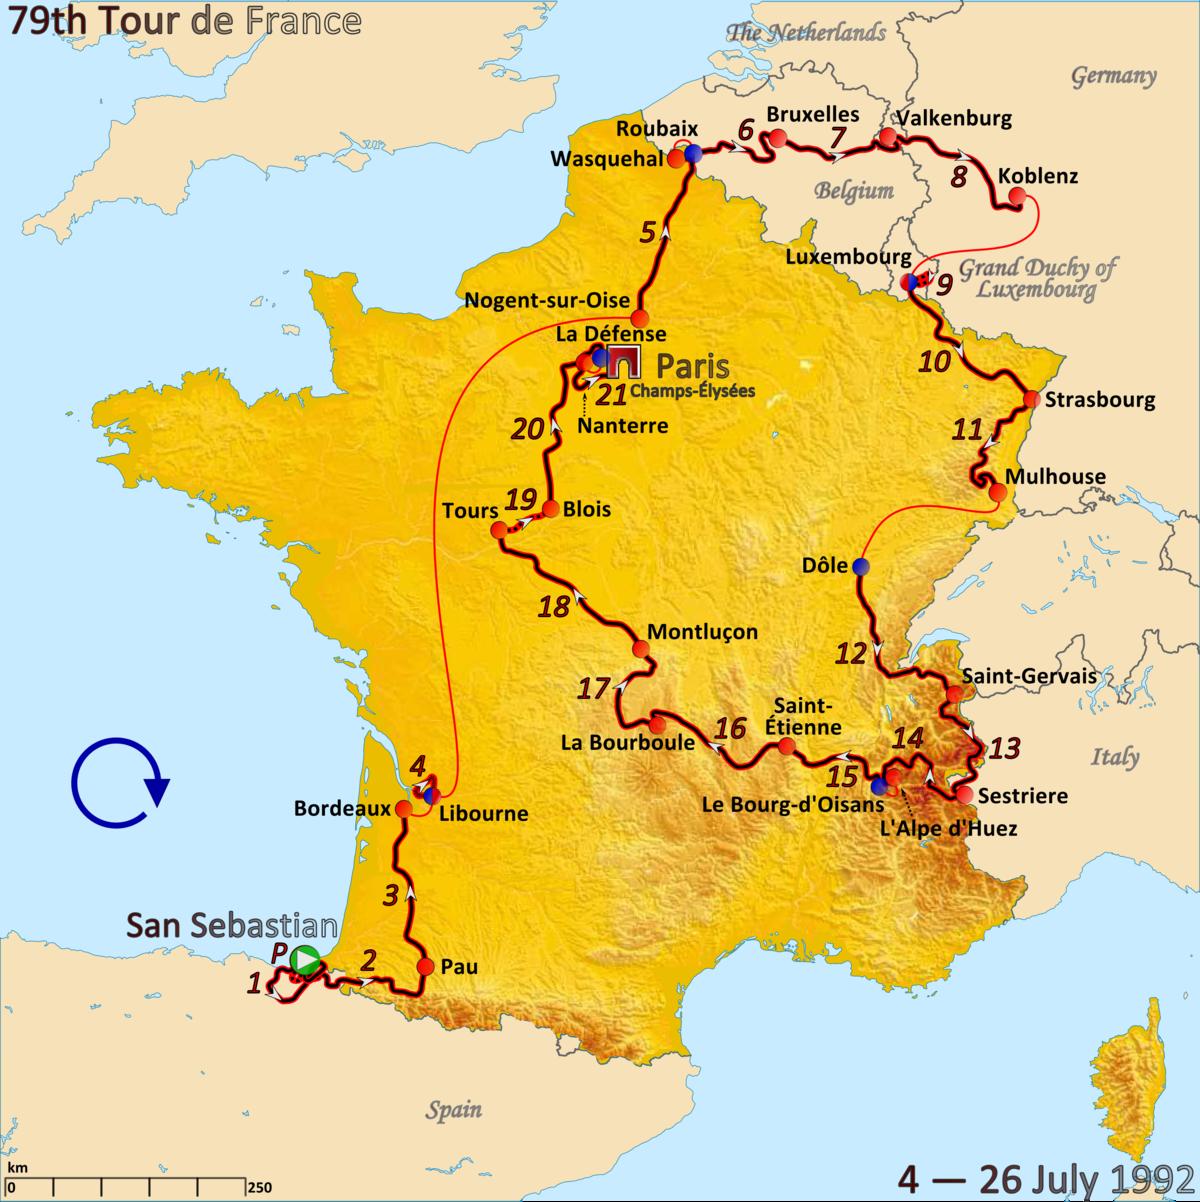 1992 Tour de France - Wikipedia